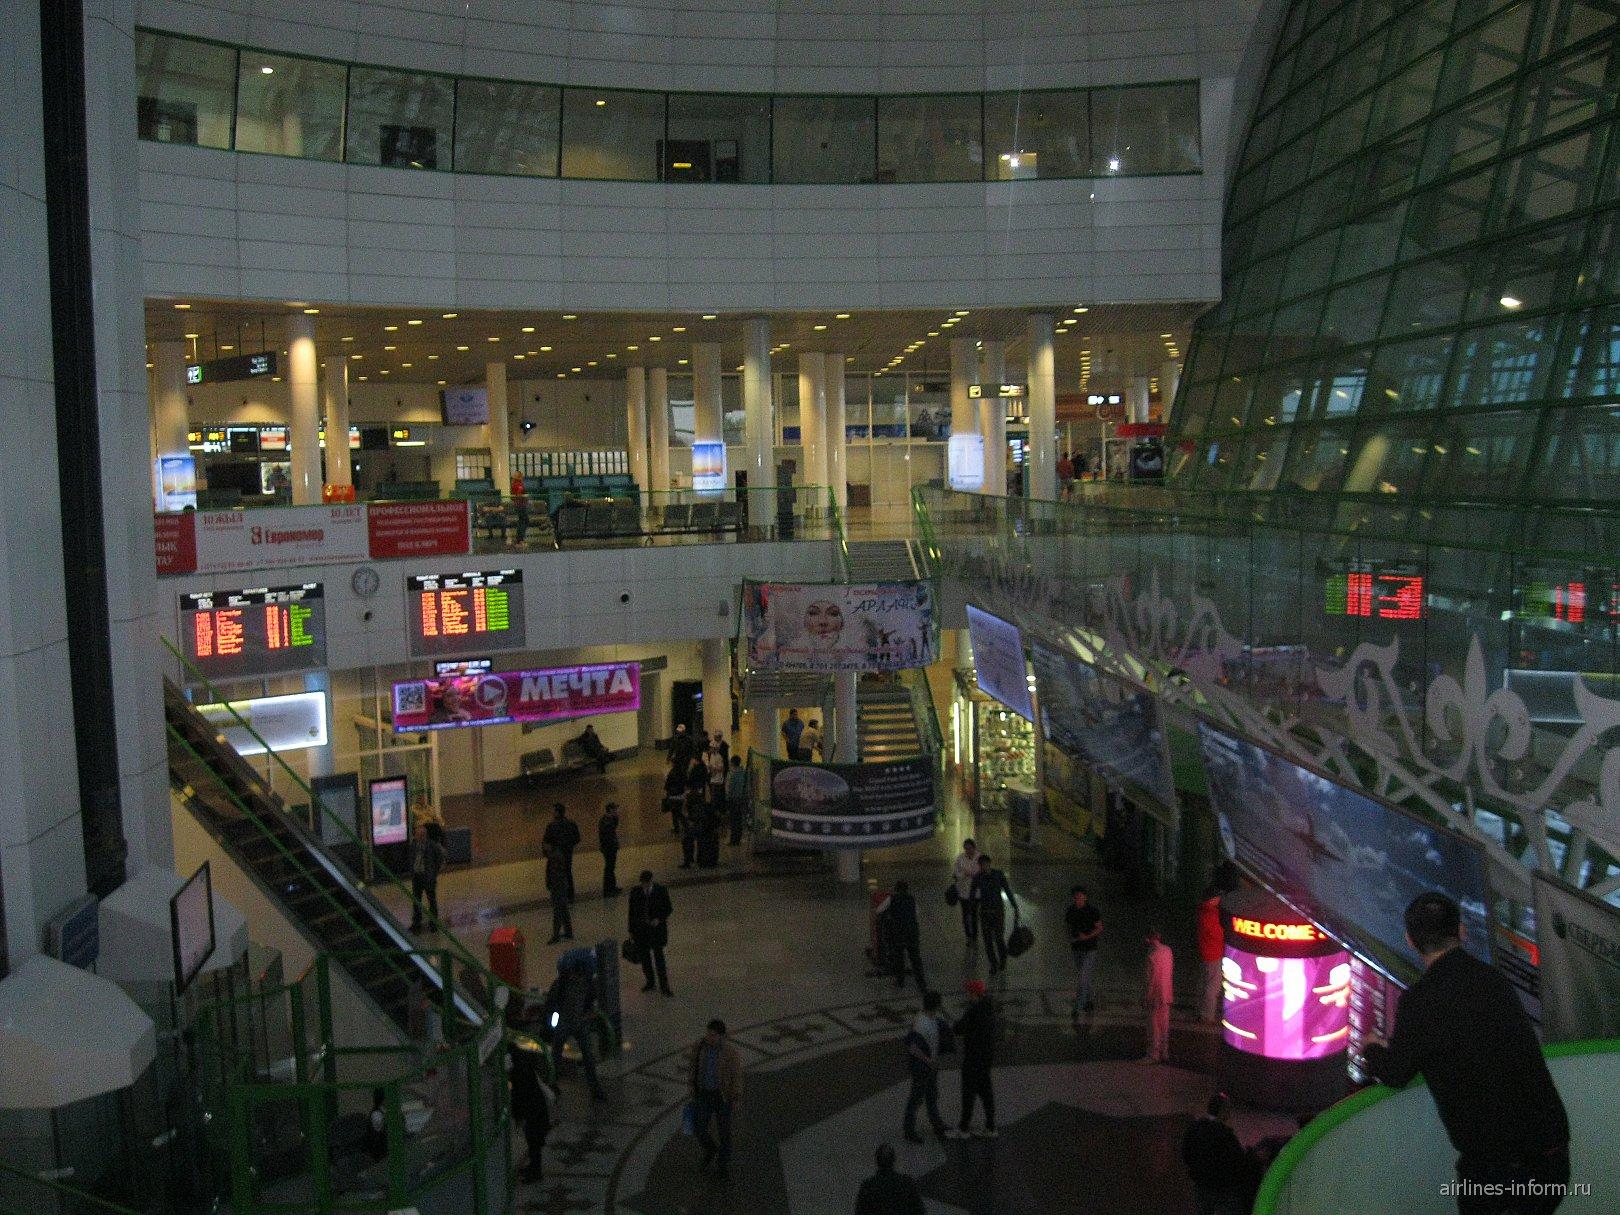 Центральный холл аэровокзала в аэропорту Астаны